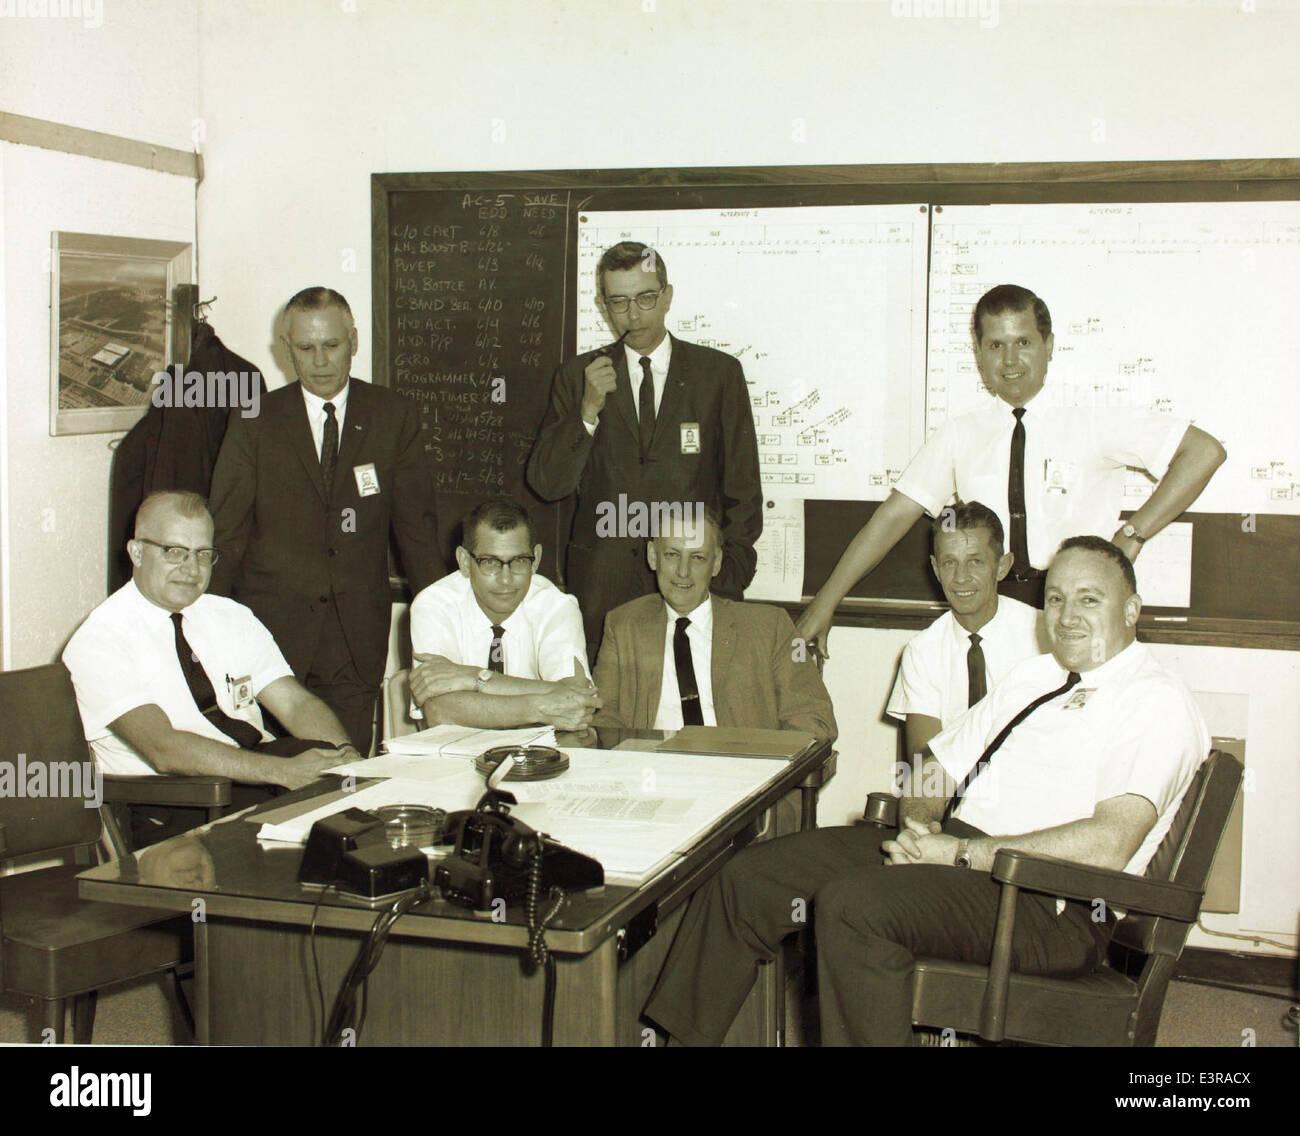 19651975 Stock Photos & 19651975 Stock Images - Alamy